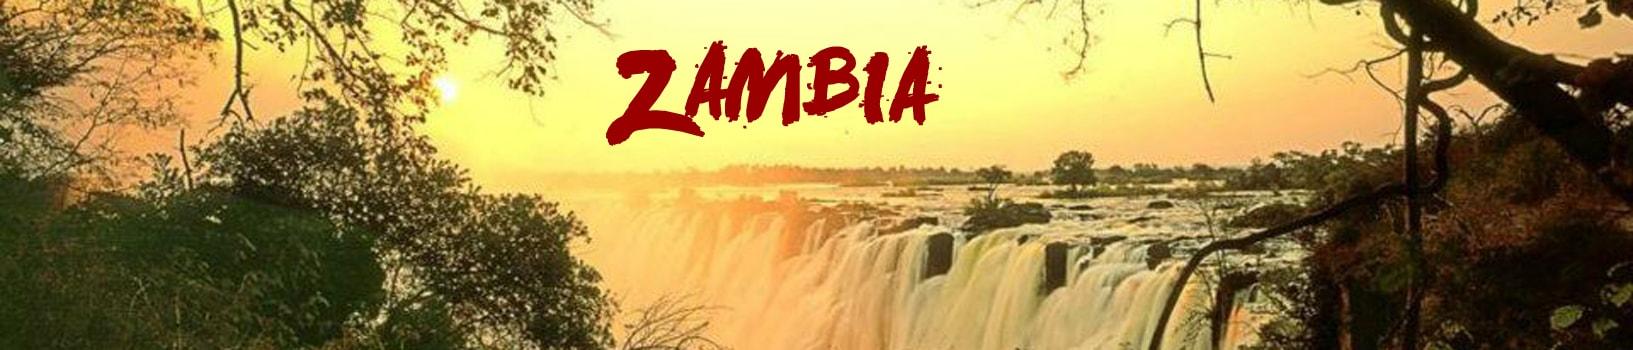 viaje-zambia